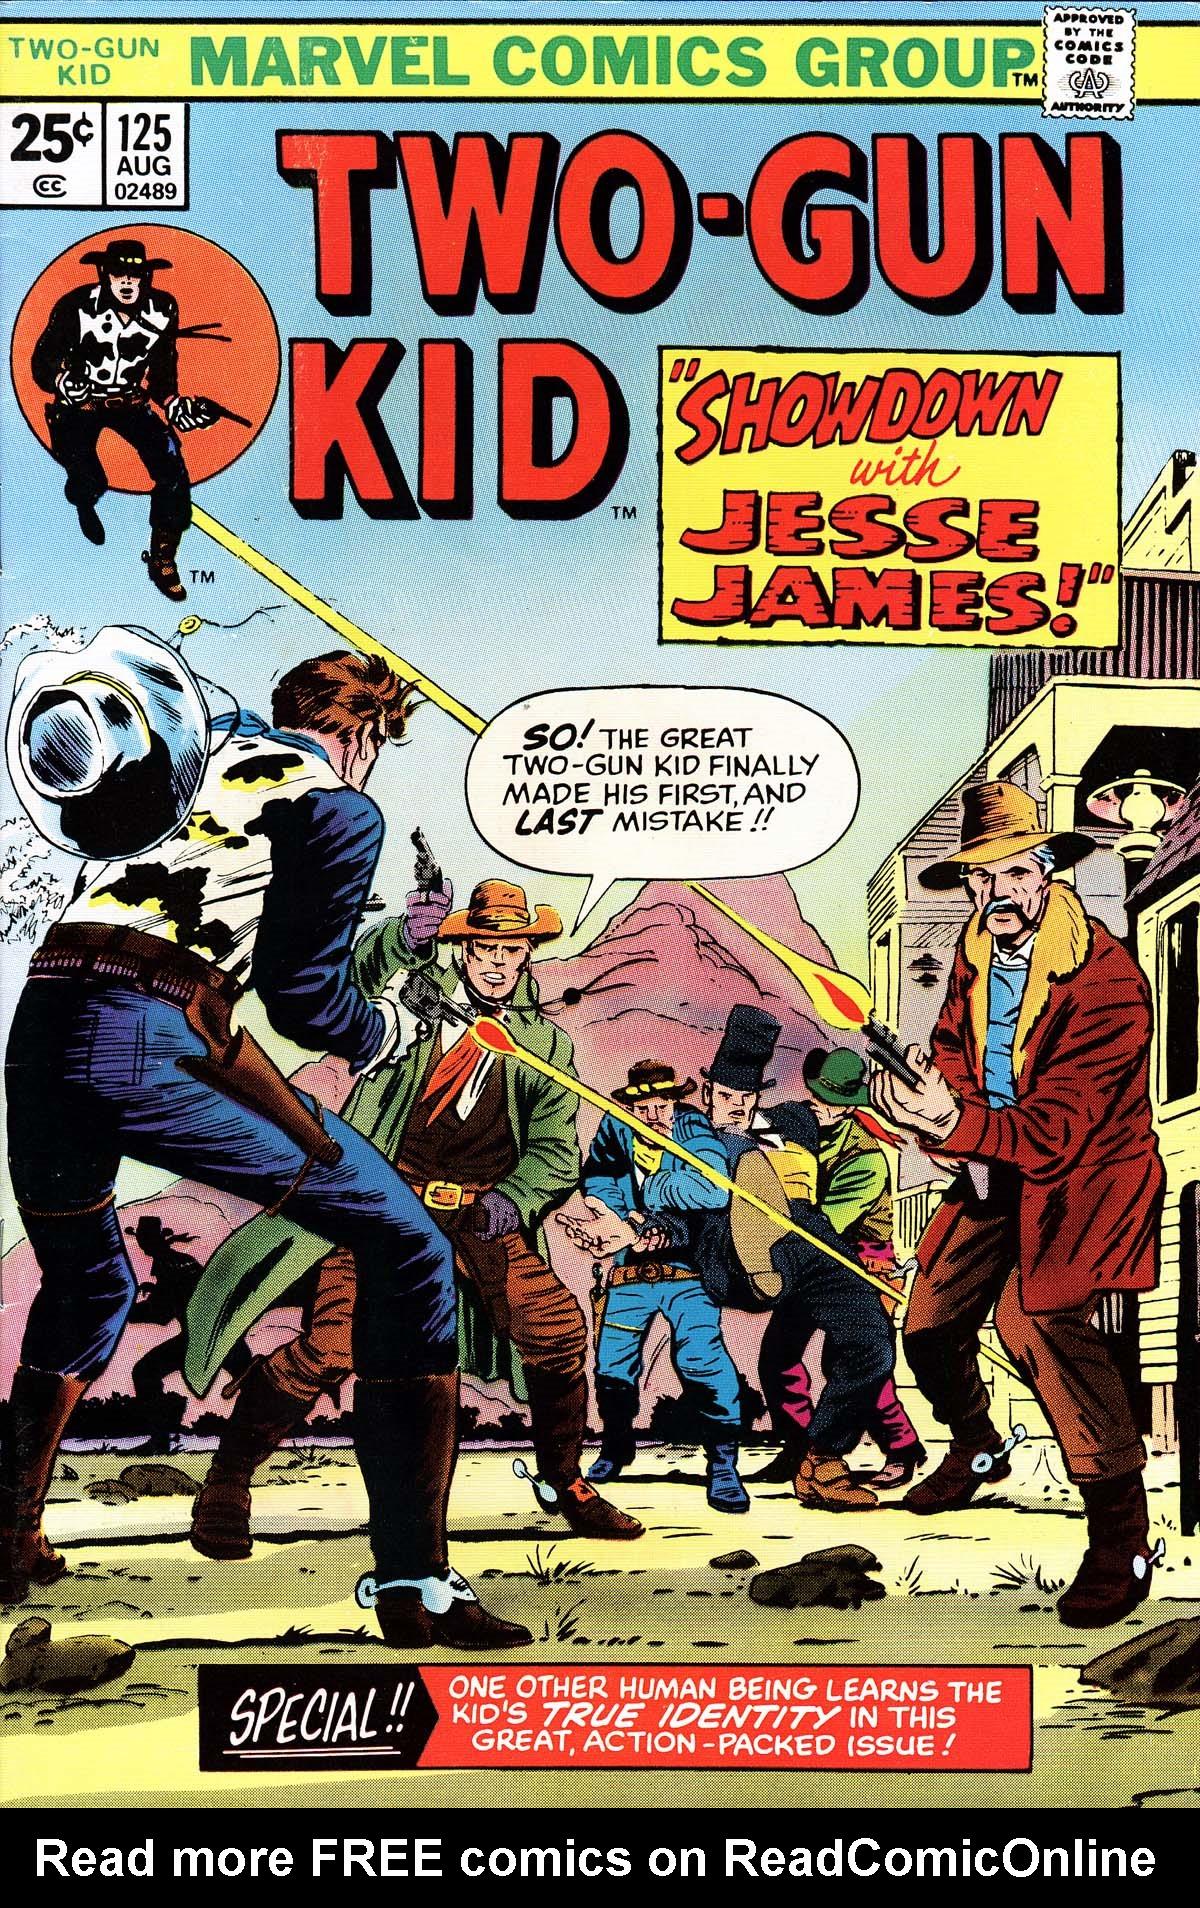 Read online Two-Gun Kid comic -  Issue #125 - 1